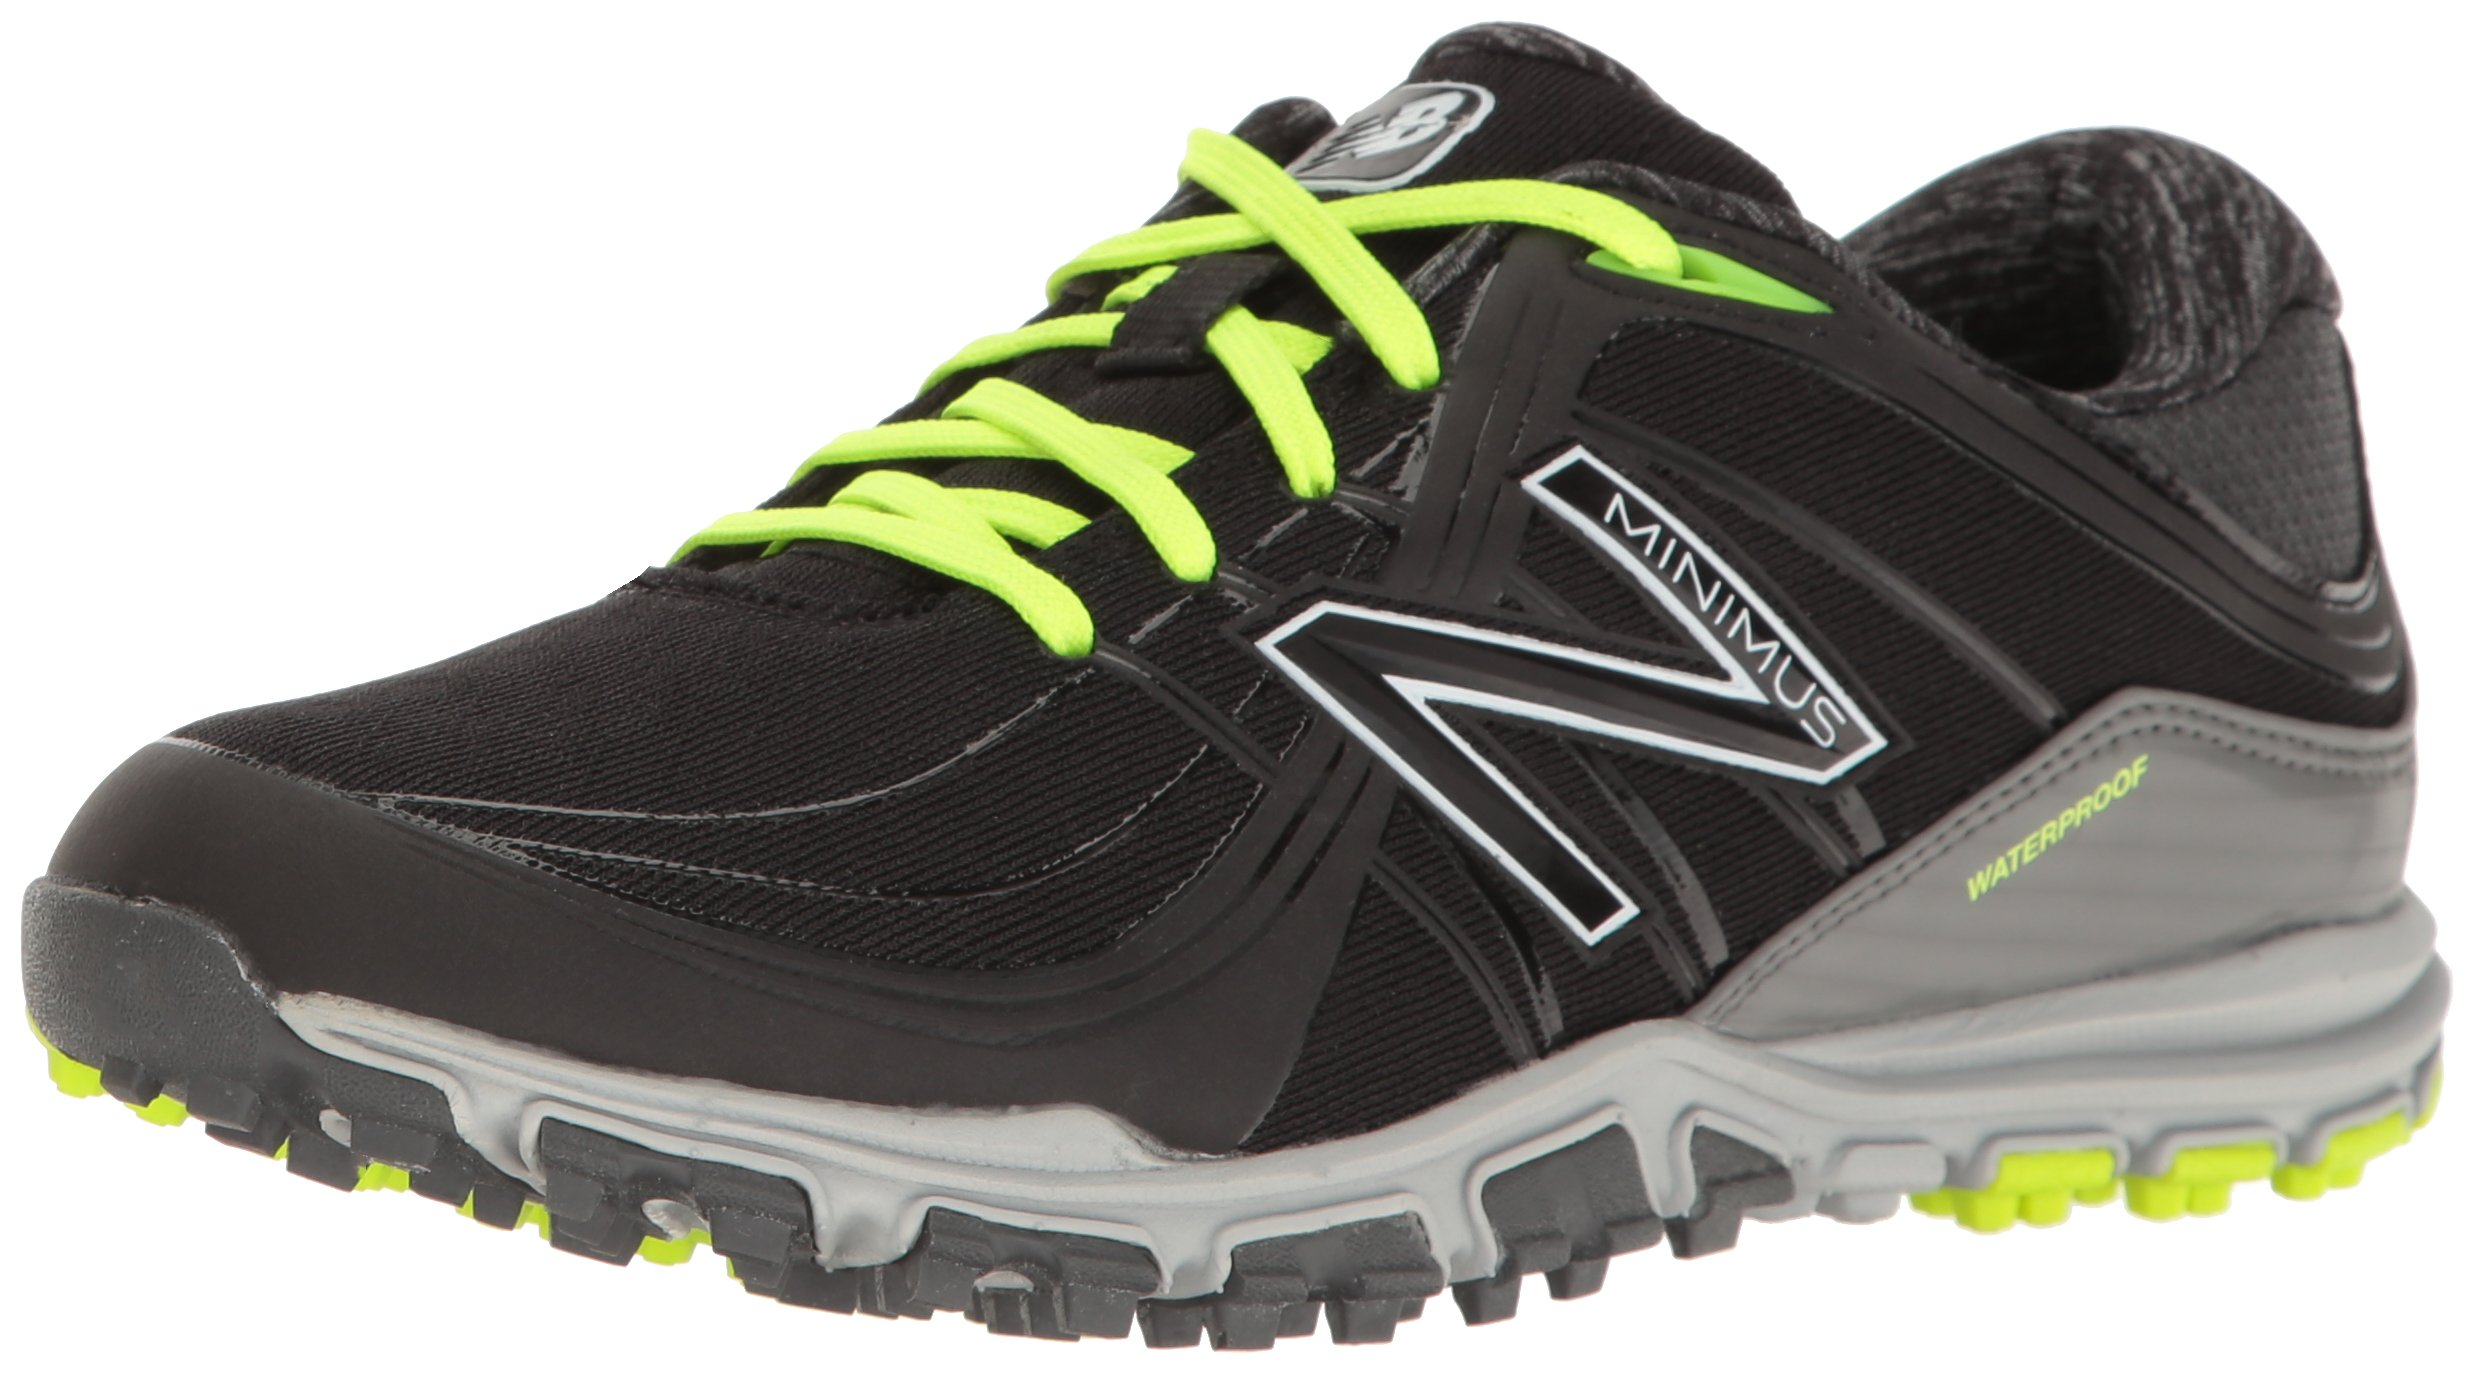 New Balance Women's nbgw1005 Golf Shoe, Black/Lime, 8 B US